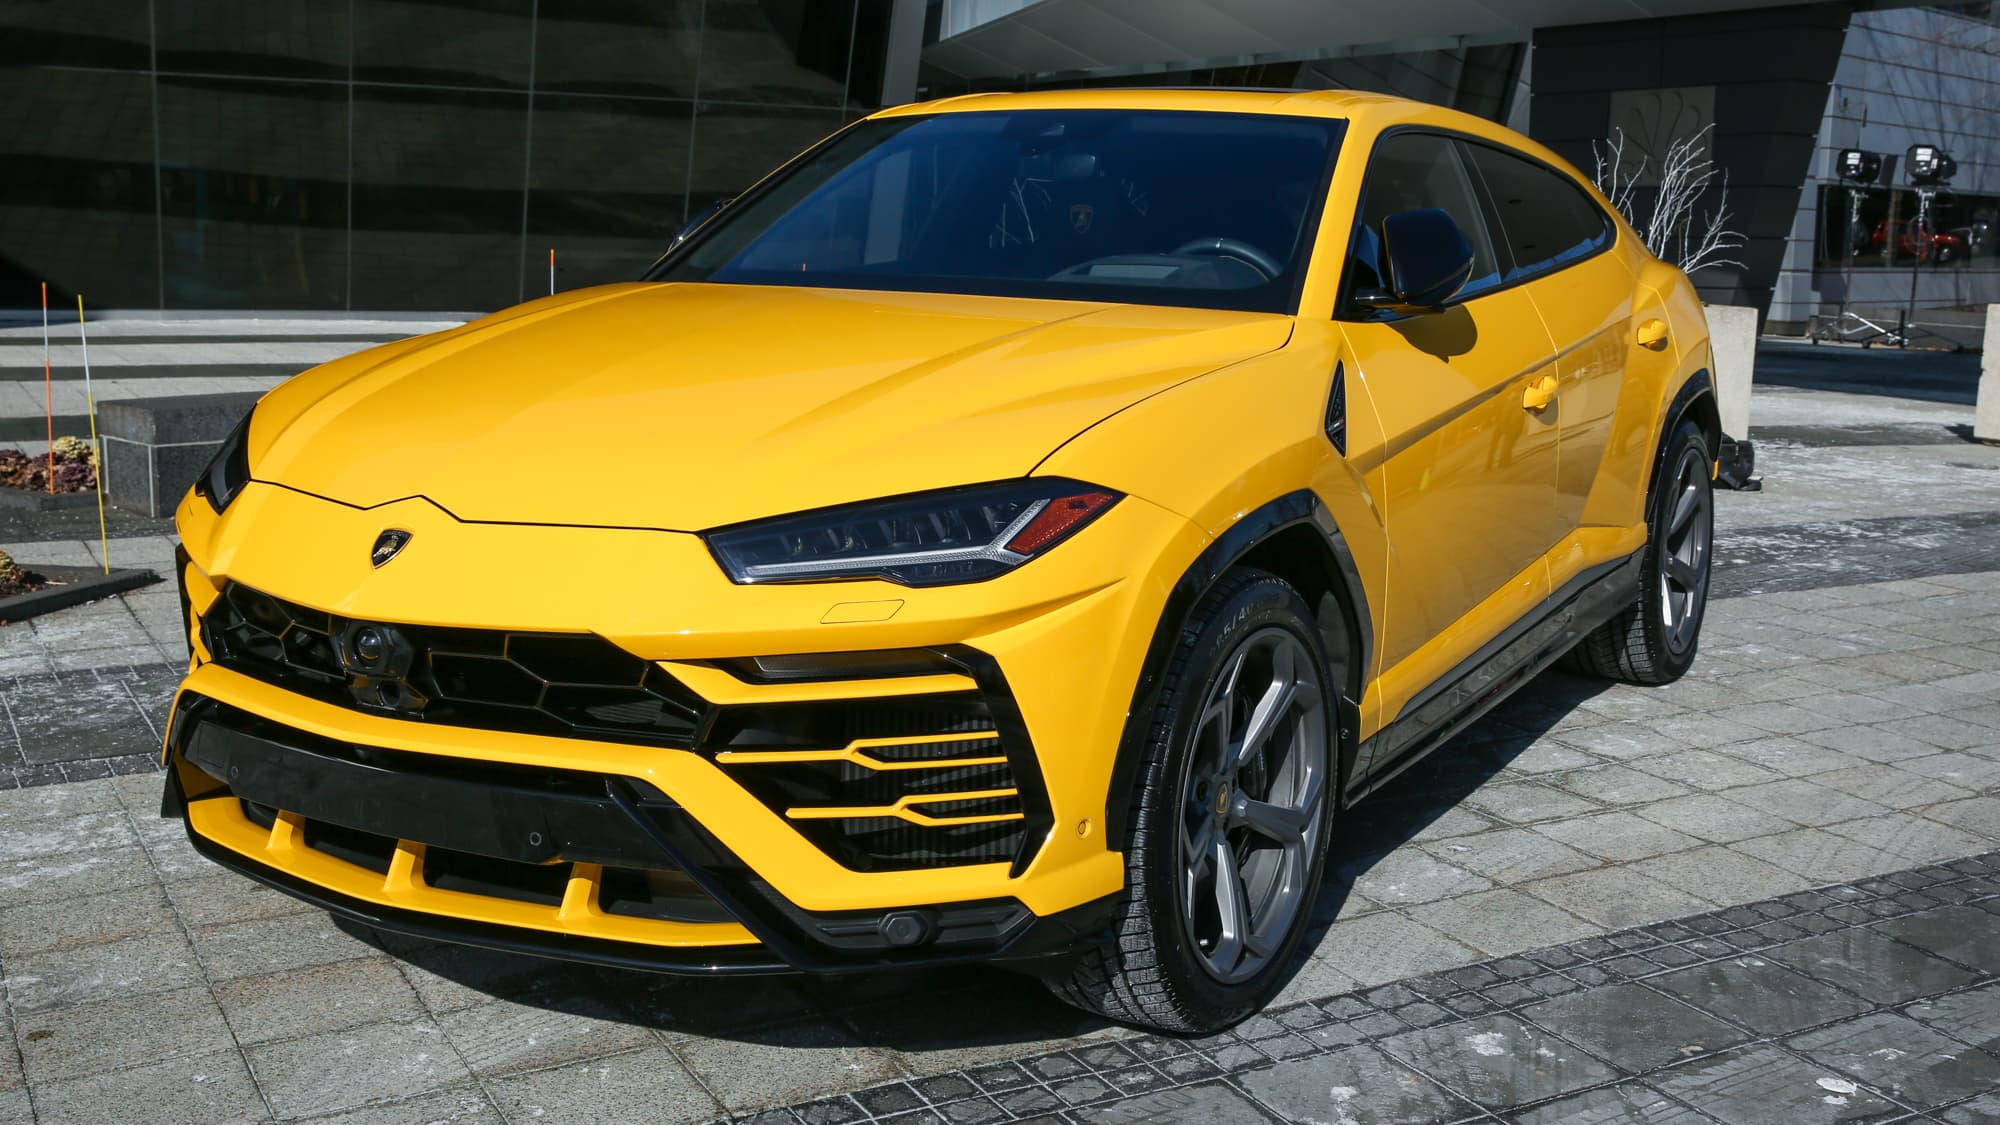 Lamborghini reports record profits, CEO teases electric future